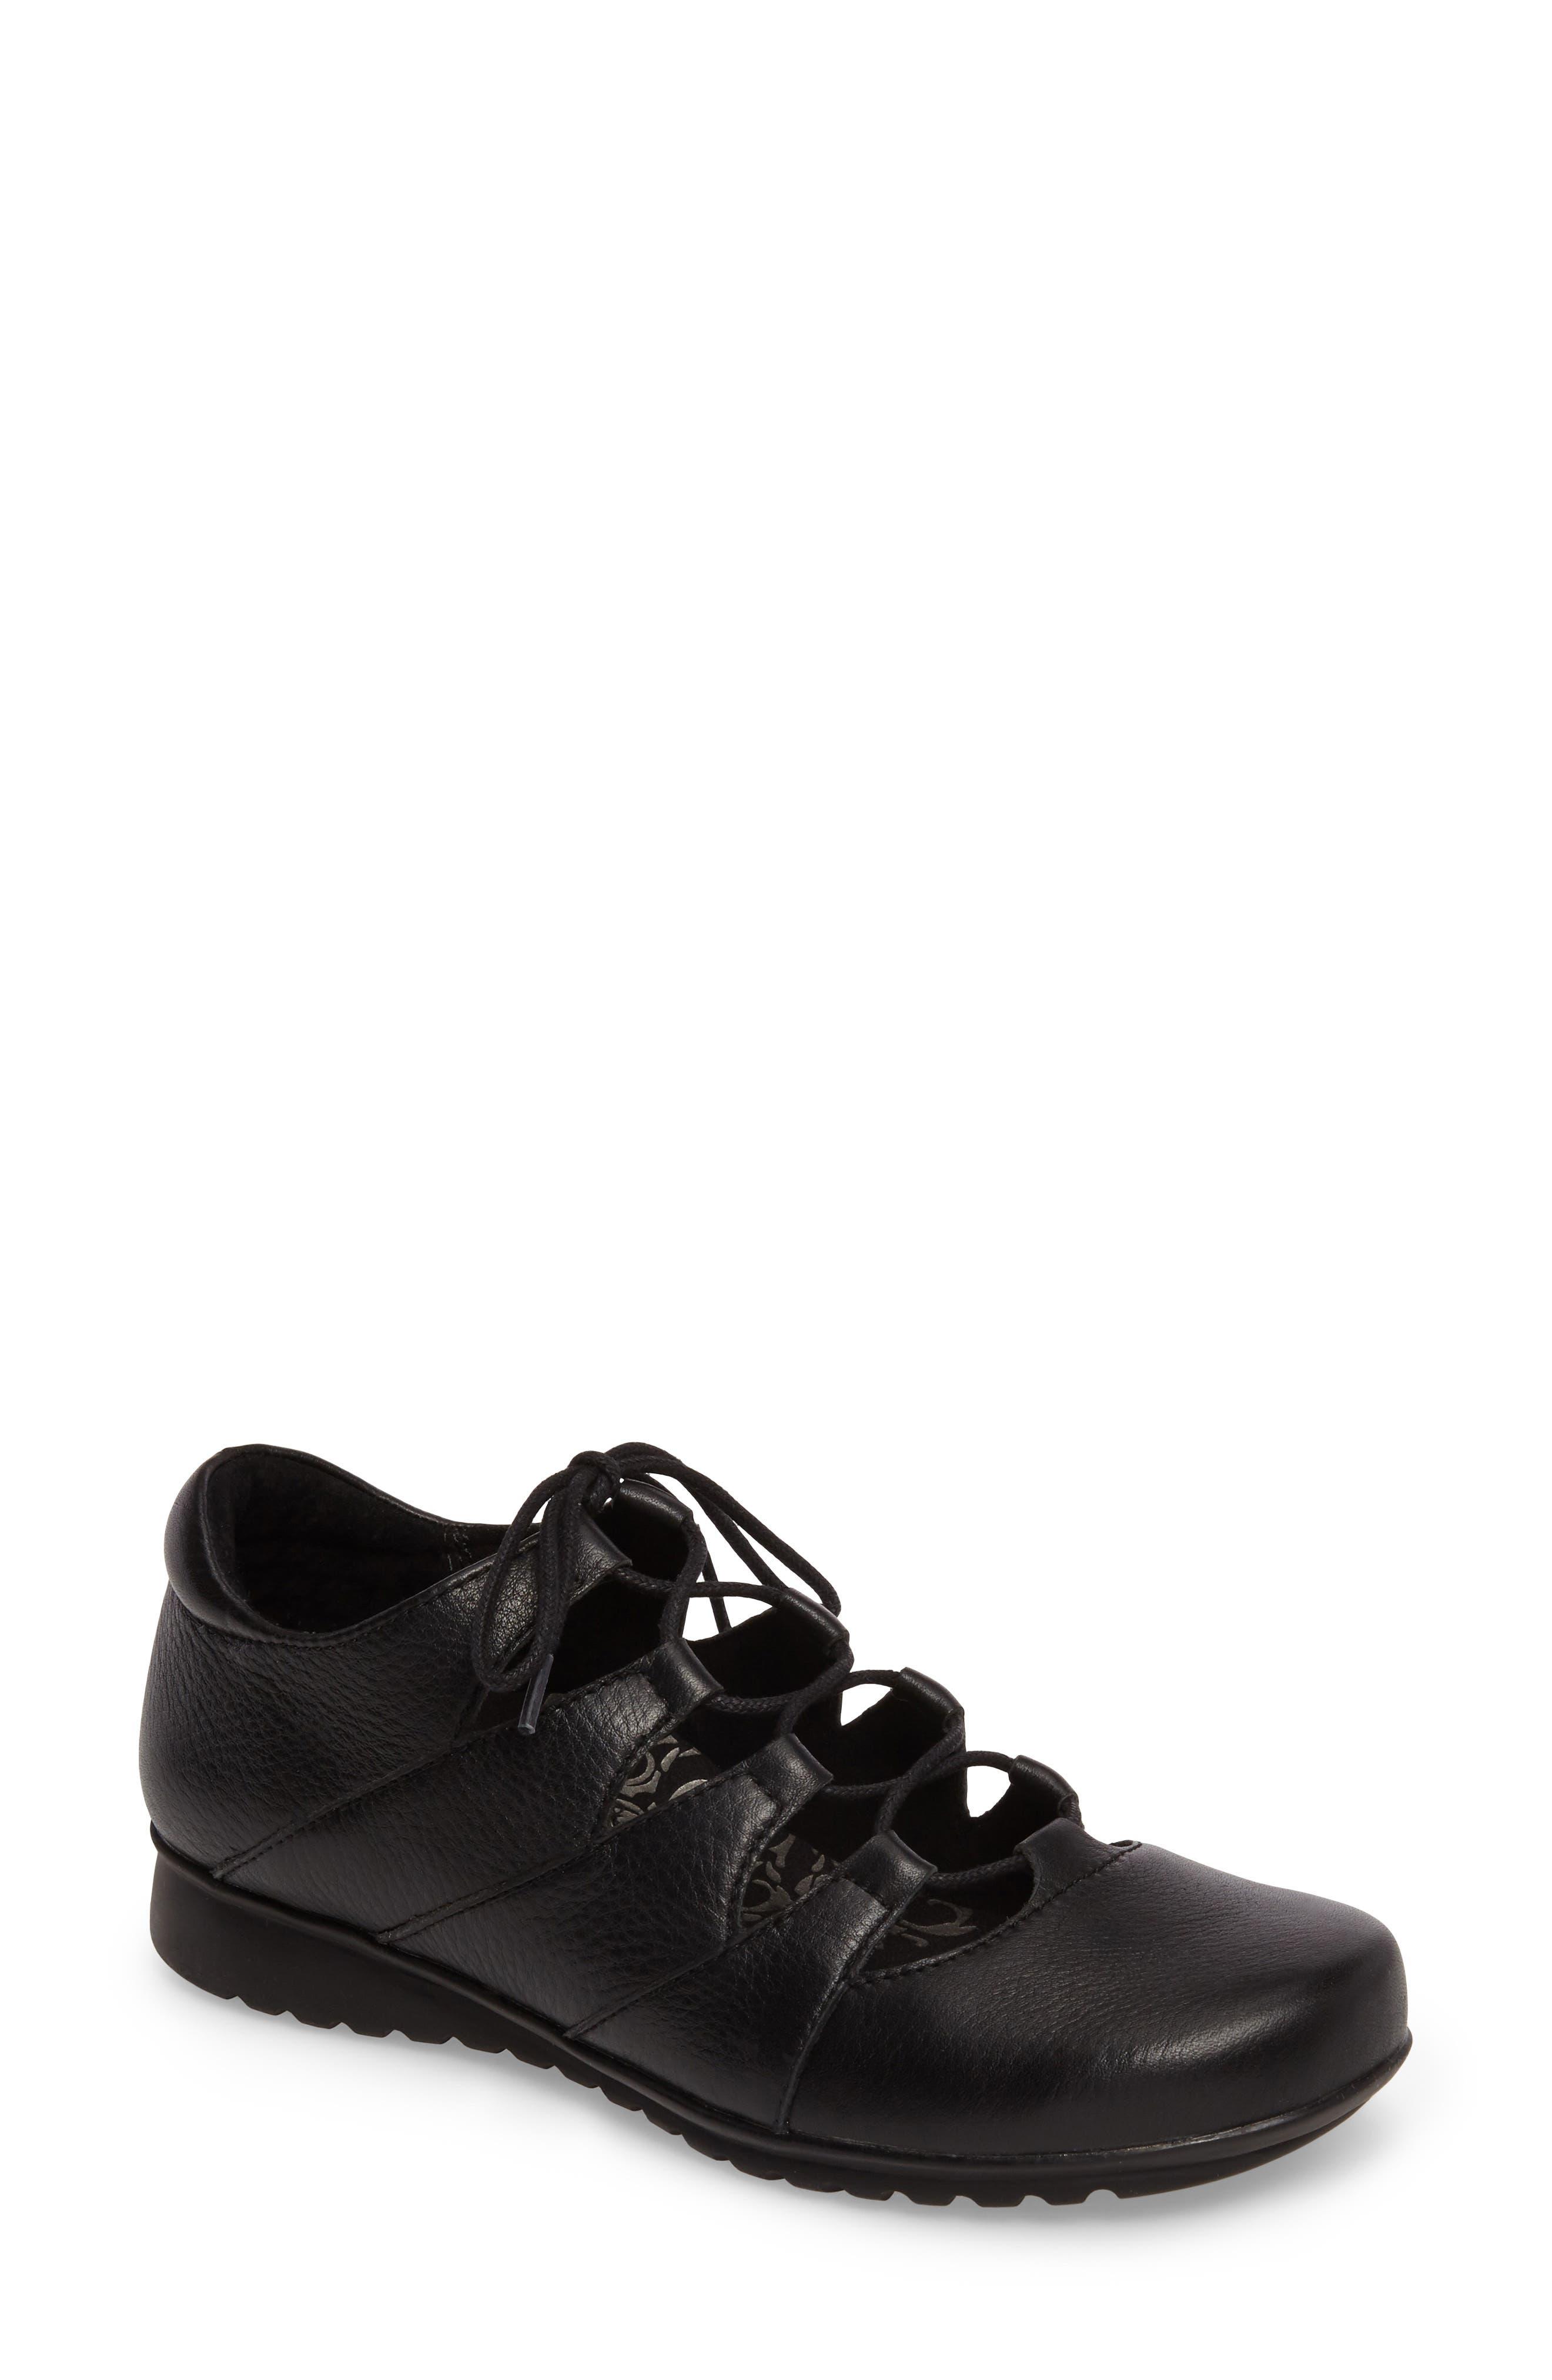 AETREX, Sienna Cutout Sneaker, Main thumbnail 1, color, BLACK LEATHER/ BLACK